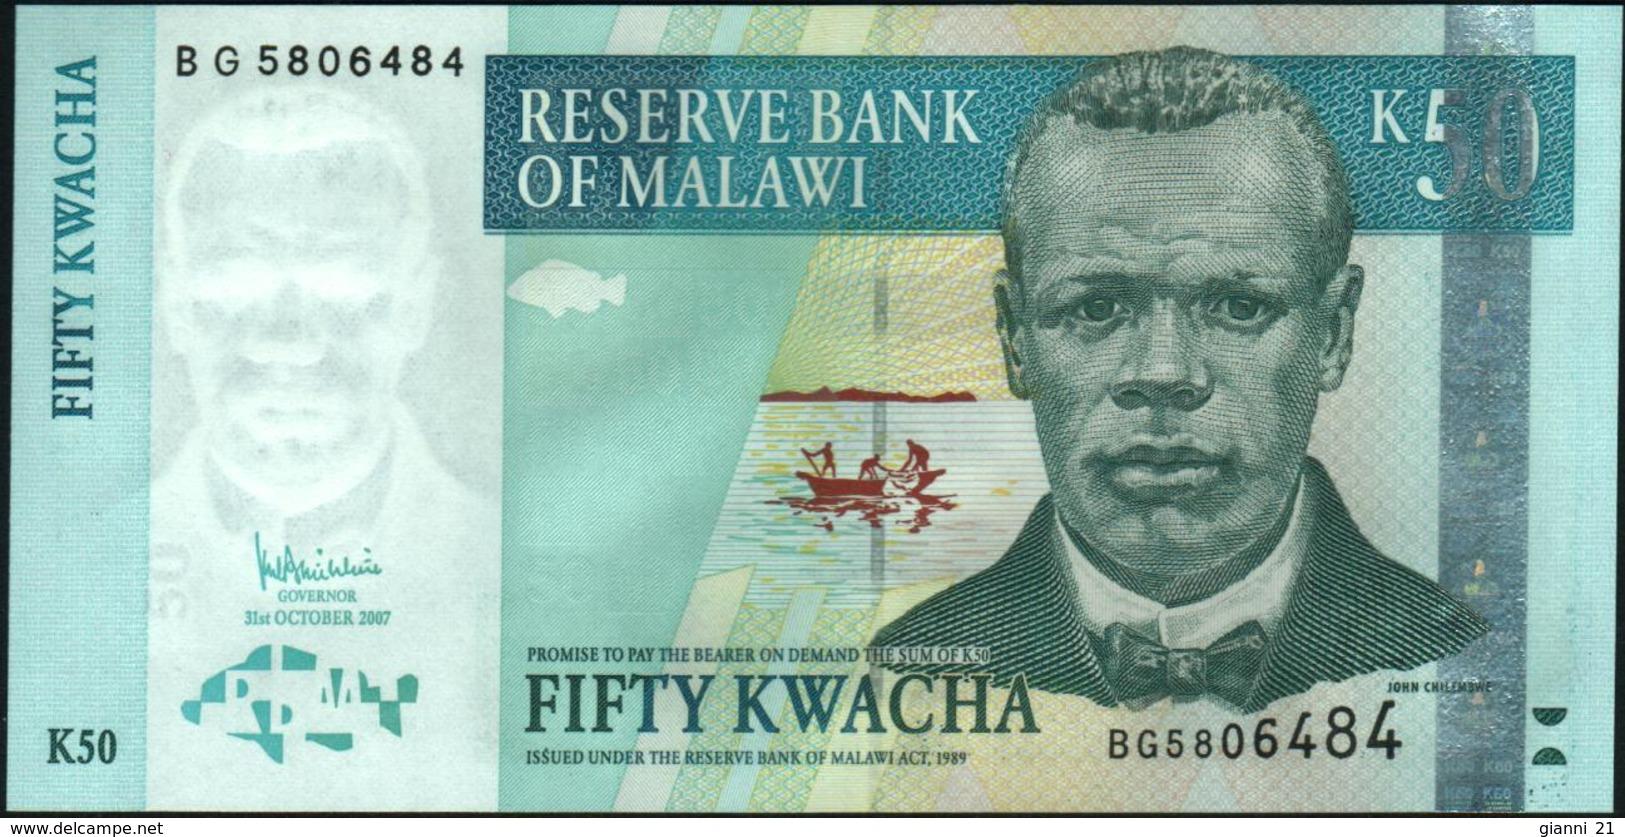 MALAWI - 50 Kwacha 31.10.2007 UNC P.53 C - Malawi